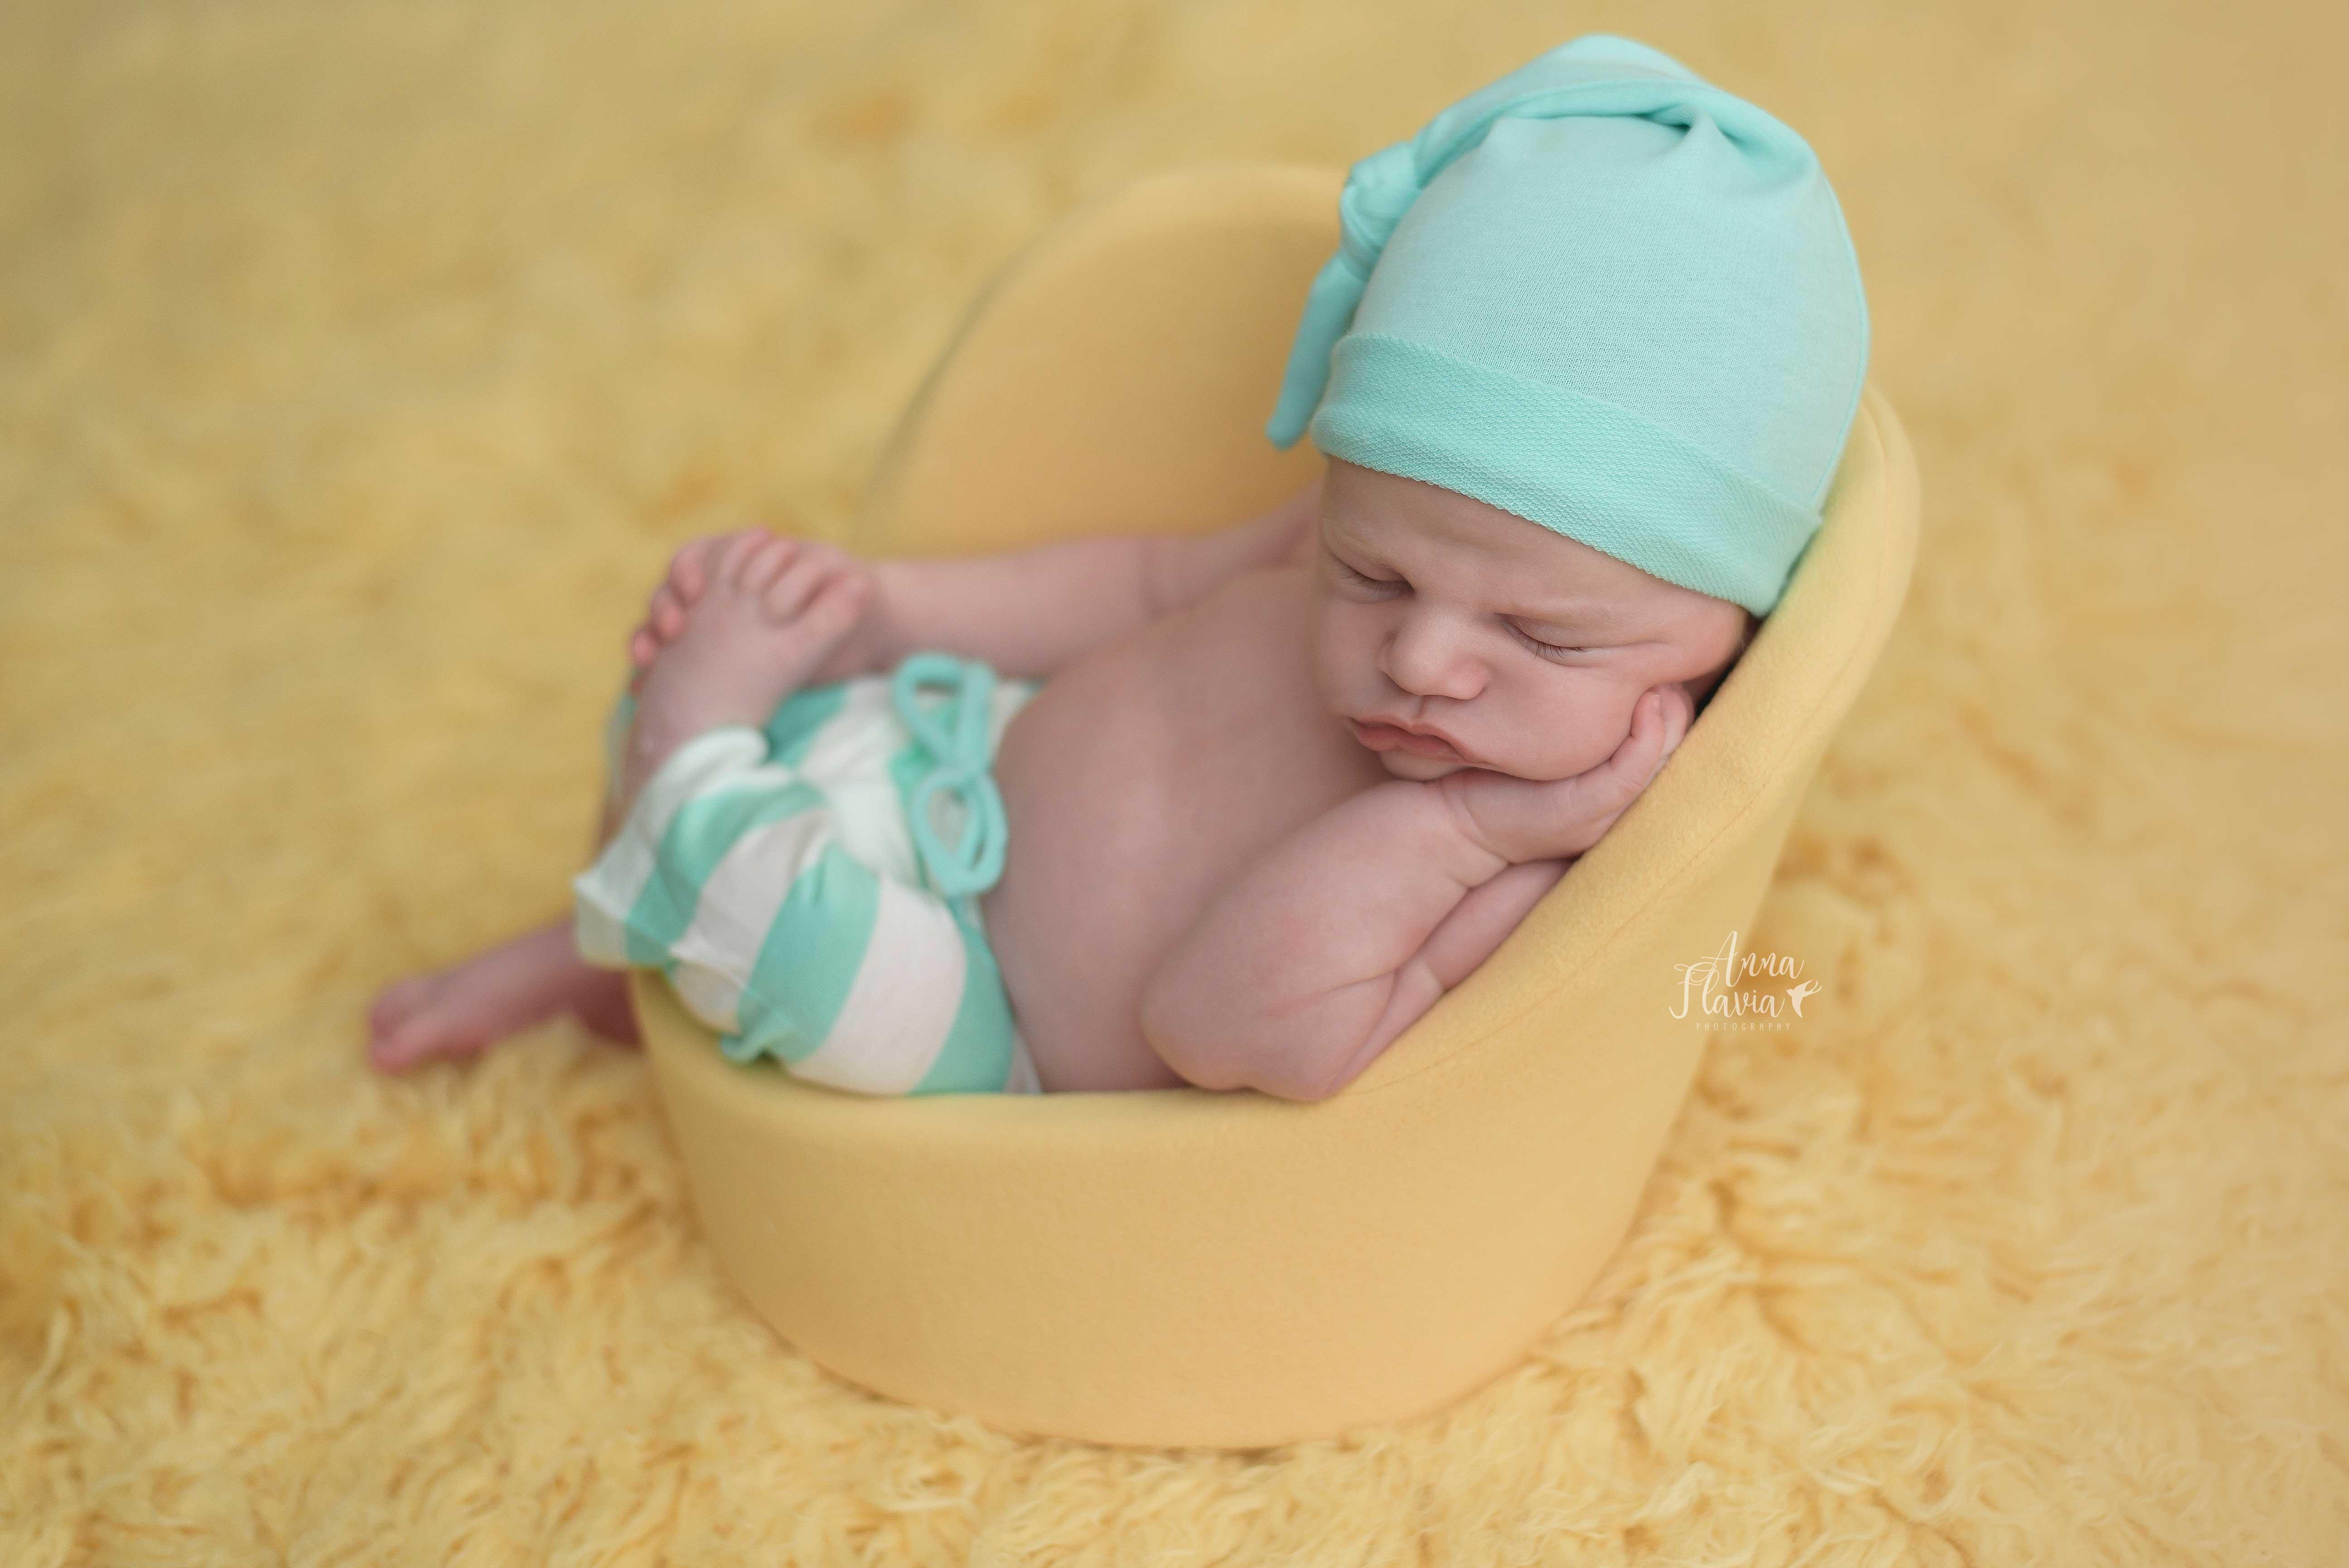 photographer_dublin_anna_flavia_newborn_maternity_33